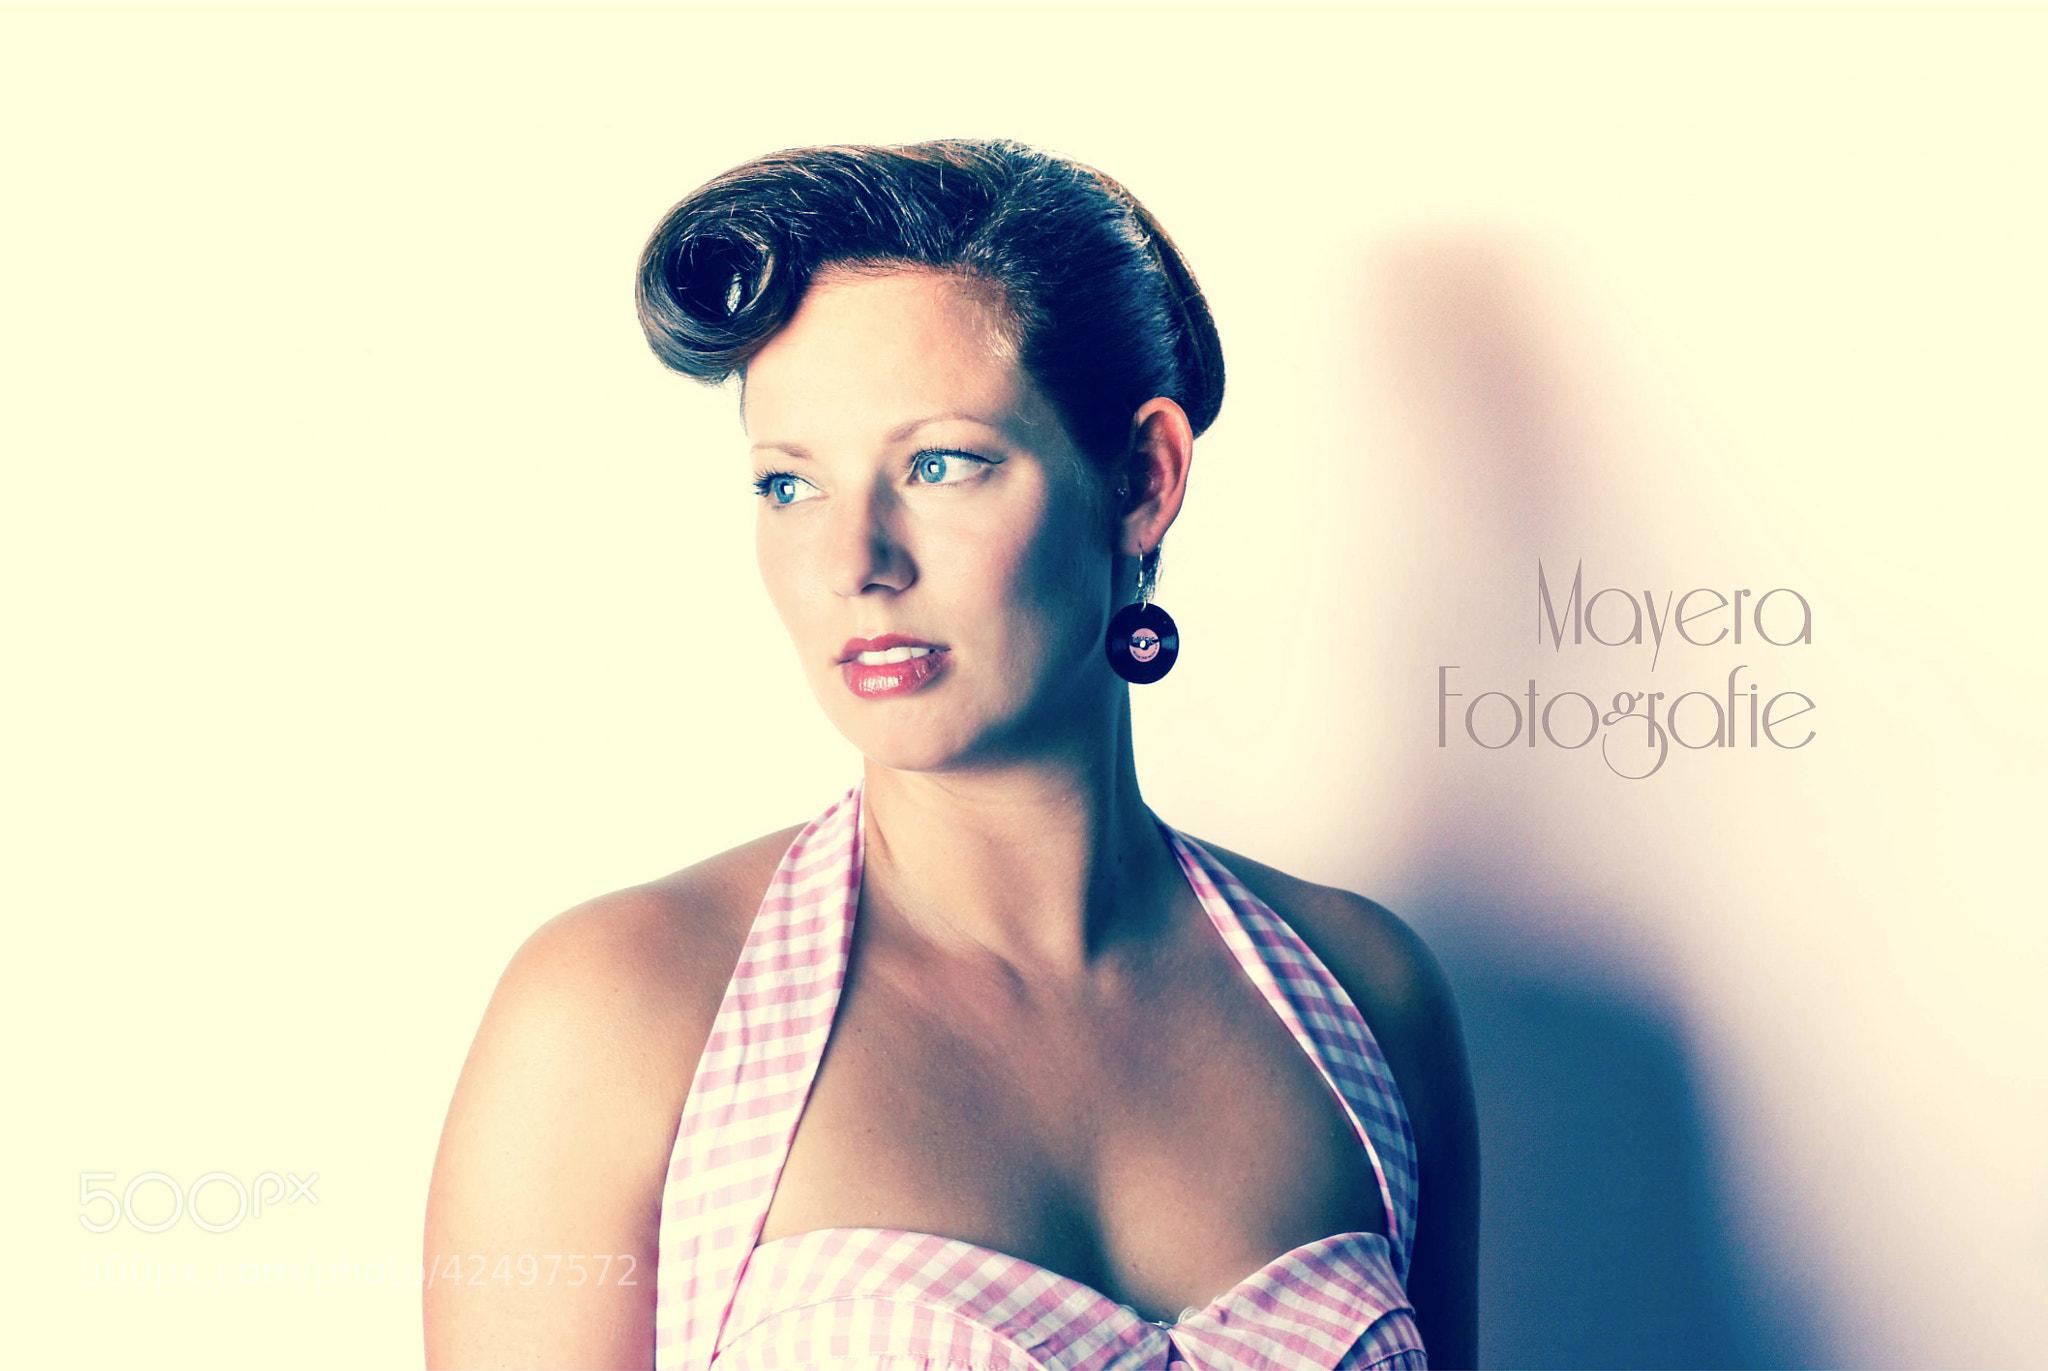 Photograph Fifties Girl by Mayera Heij on 500px